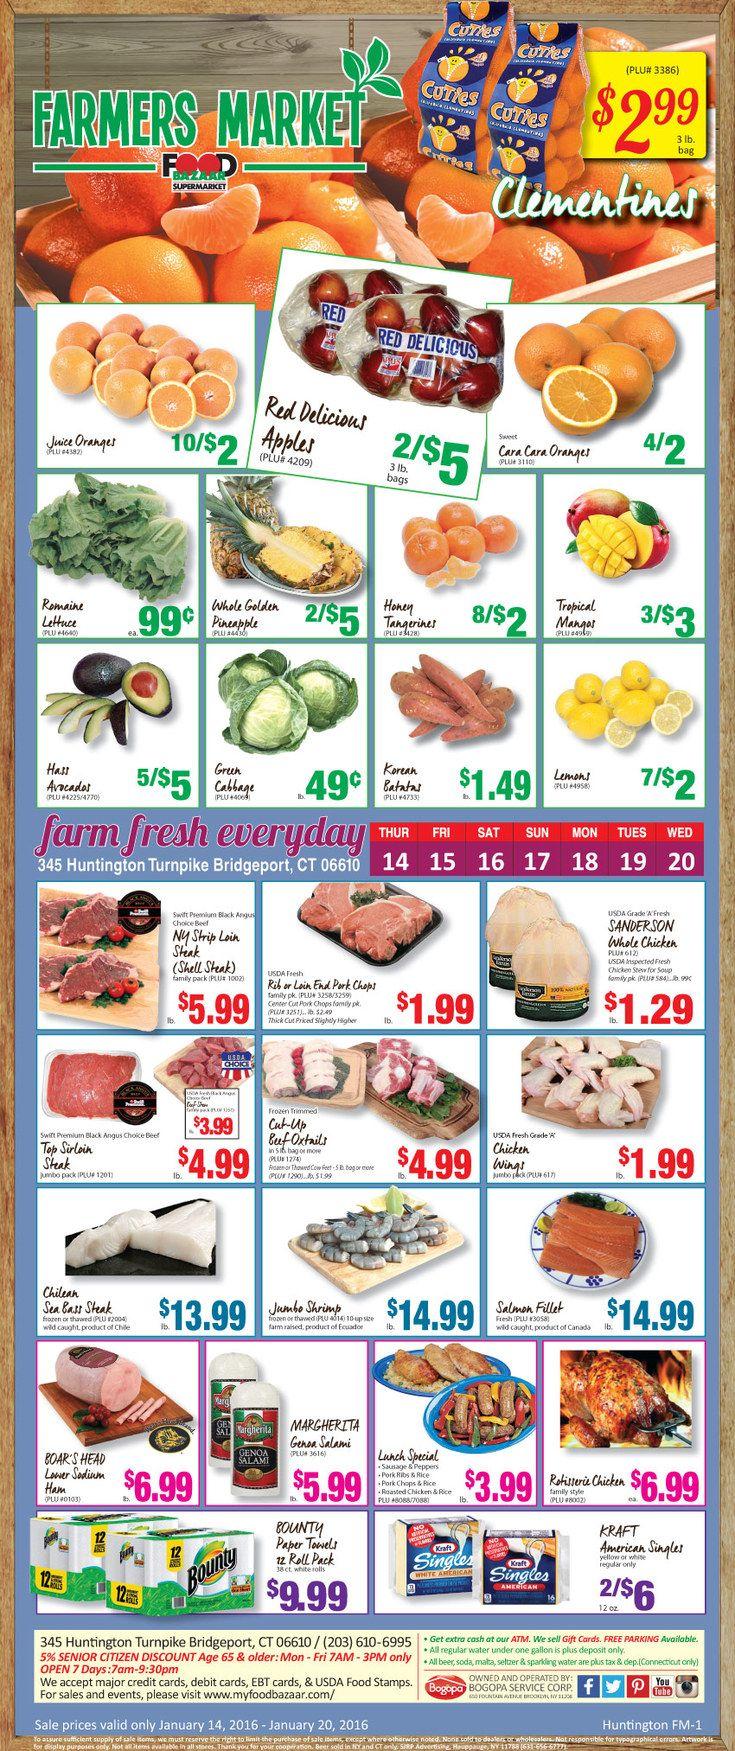 Food bazaar circular january 14 20 2016 httpwww